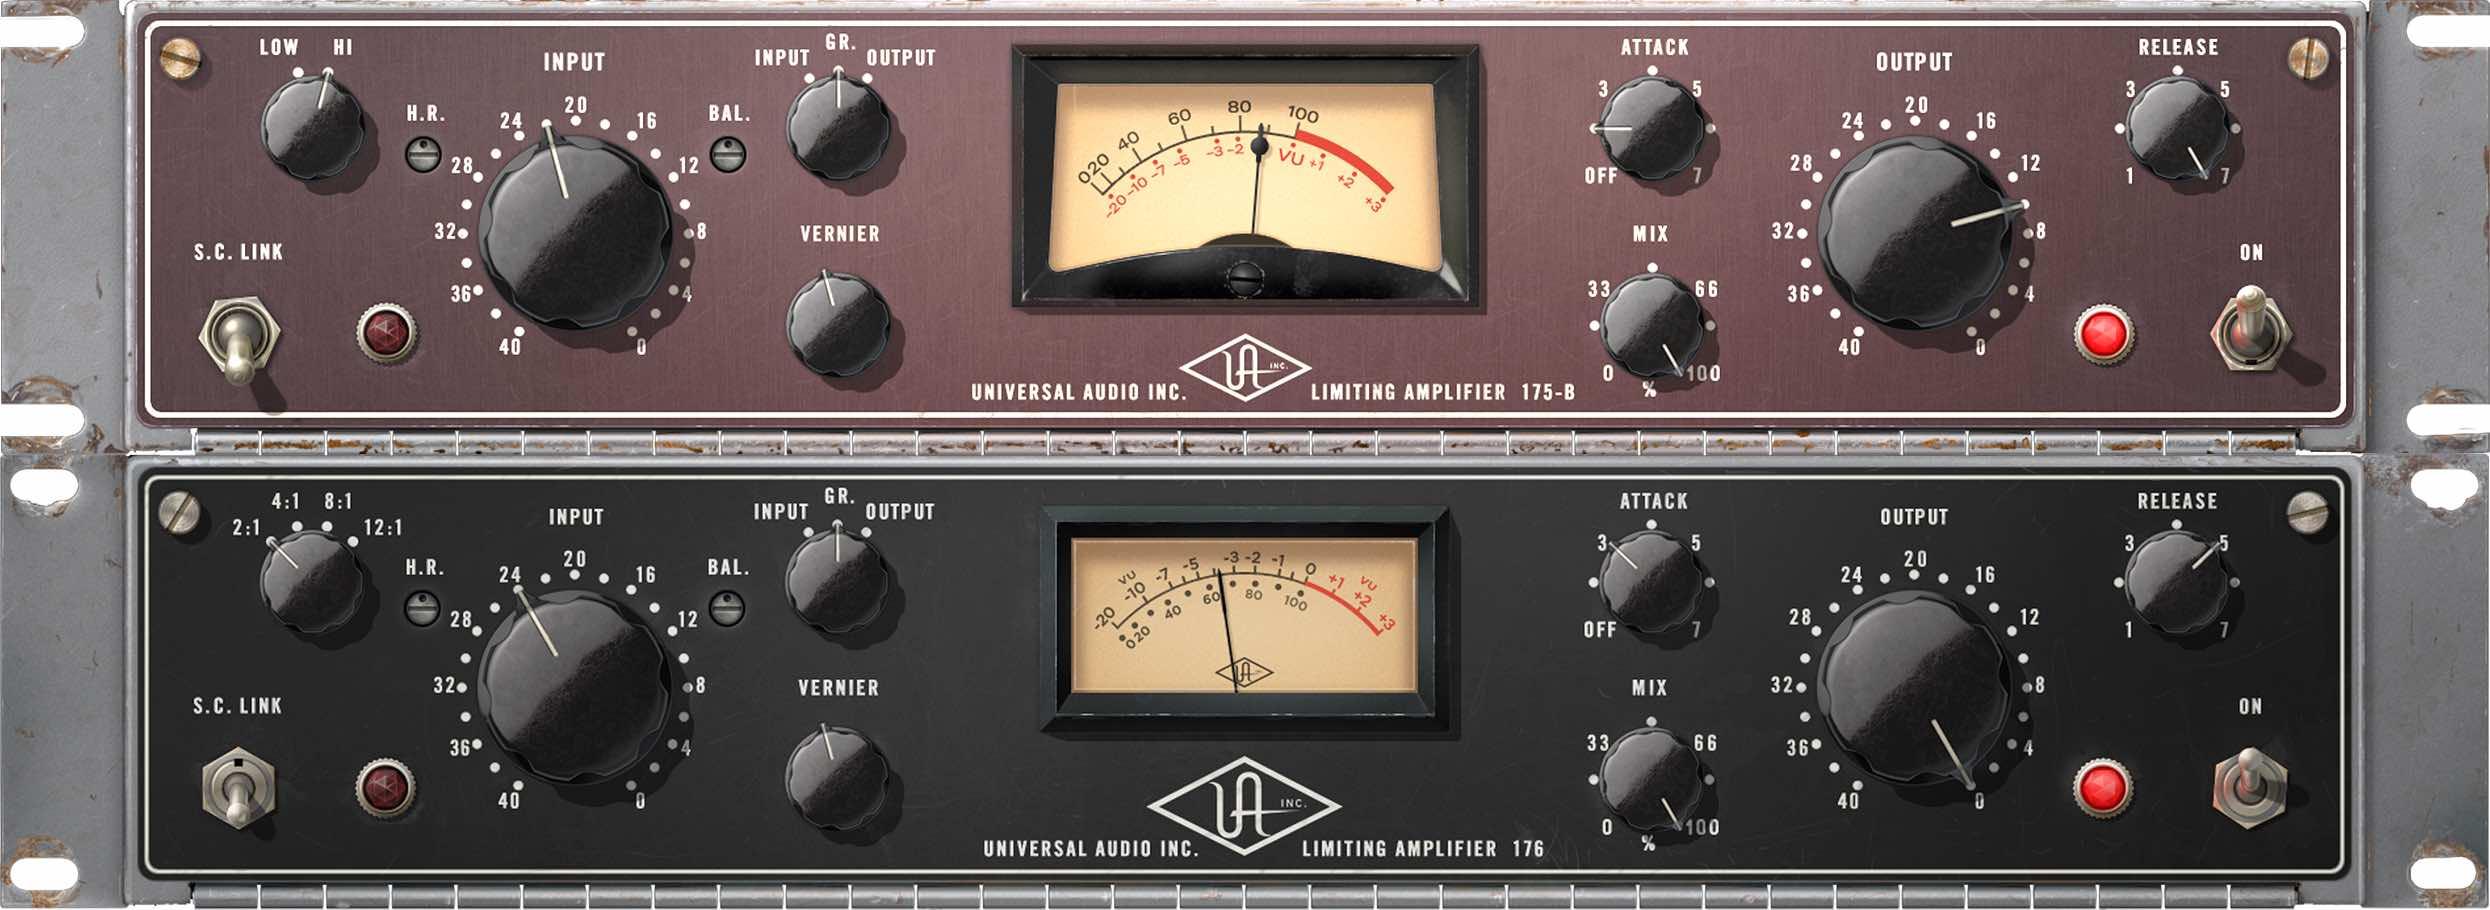 Universal Audio uad 910 software 175B 176 comp mix audiofader